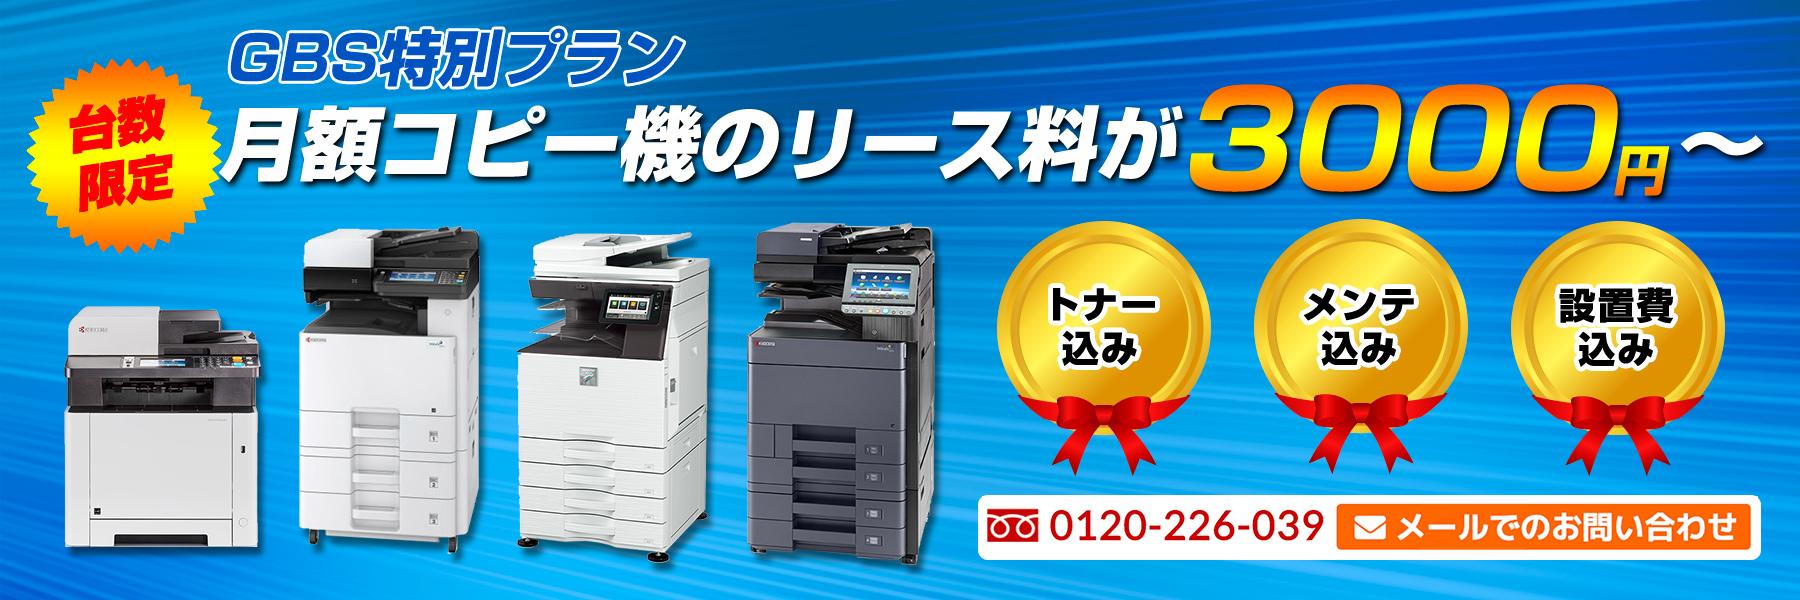 GBS特別プラン 付き学コピー機のリース料が3000円〜